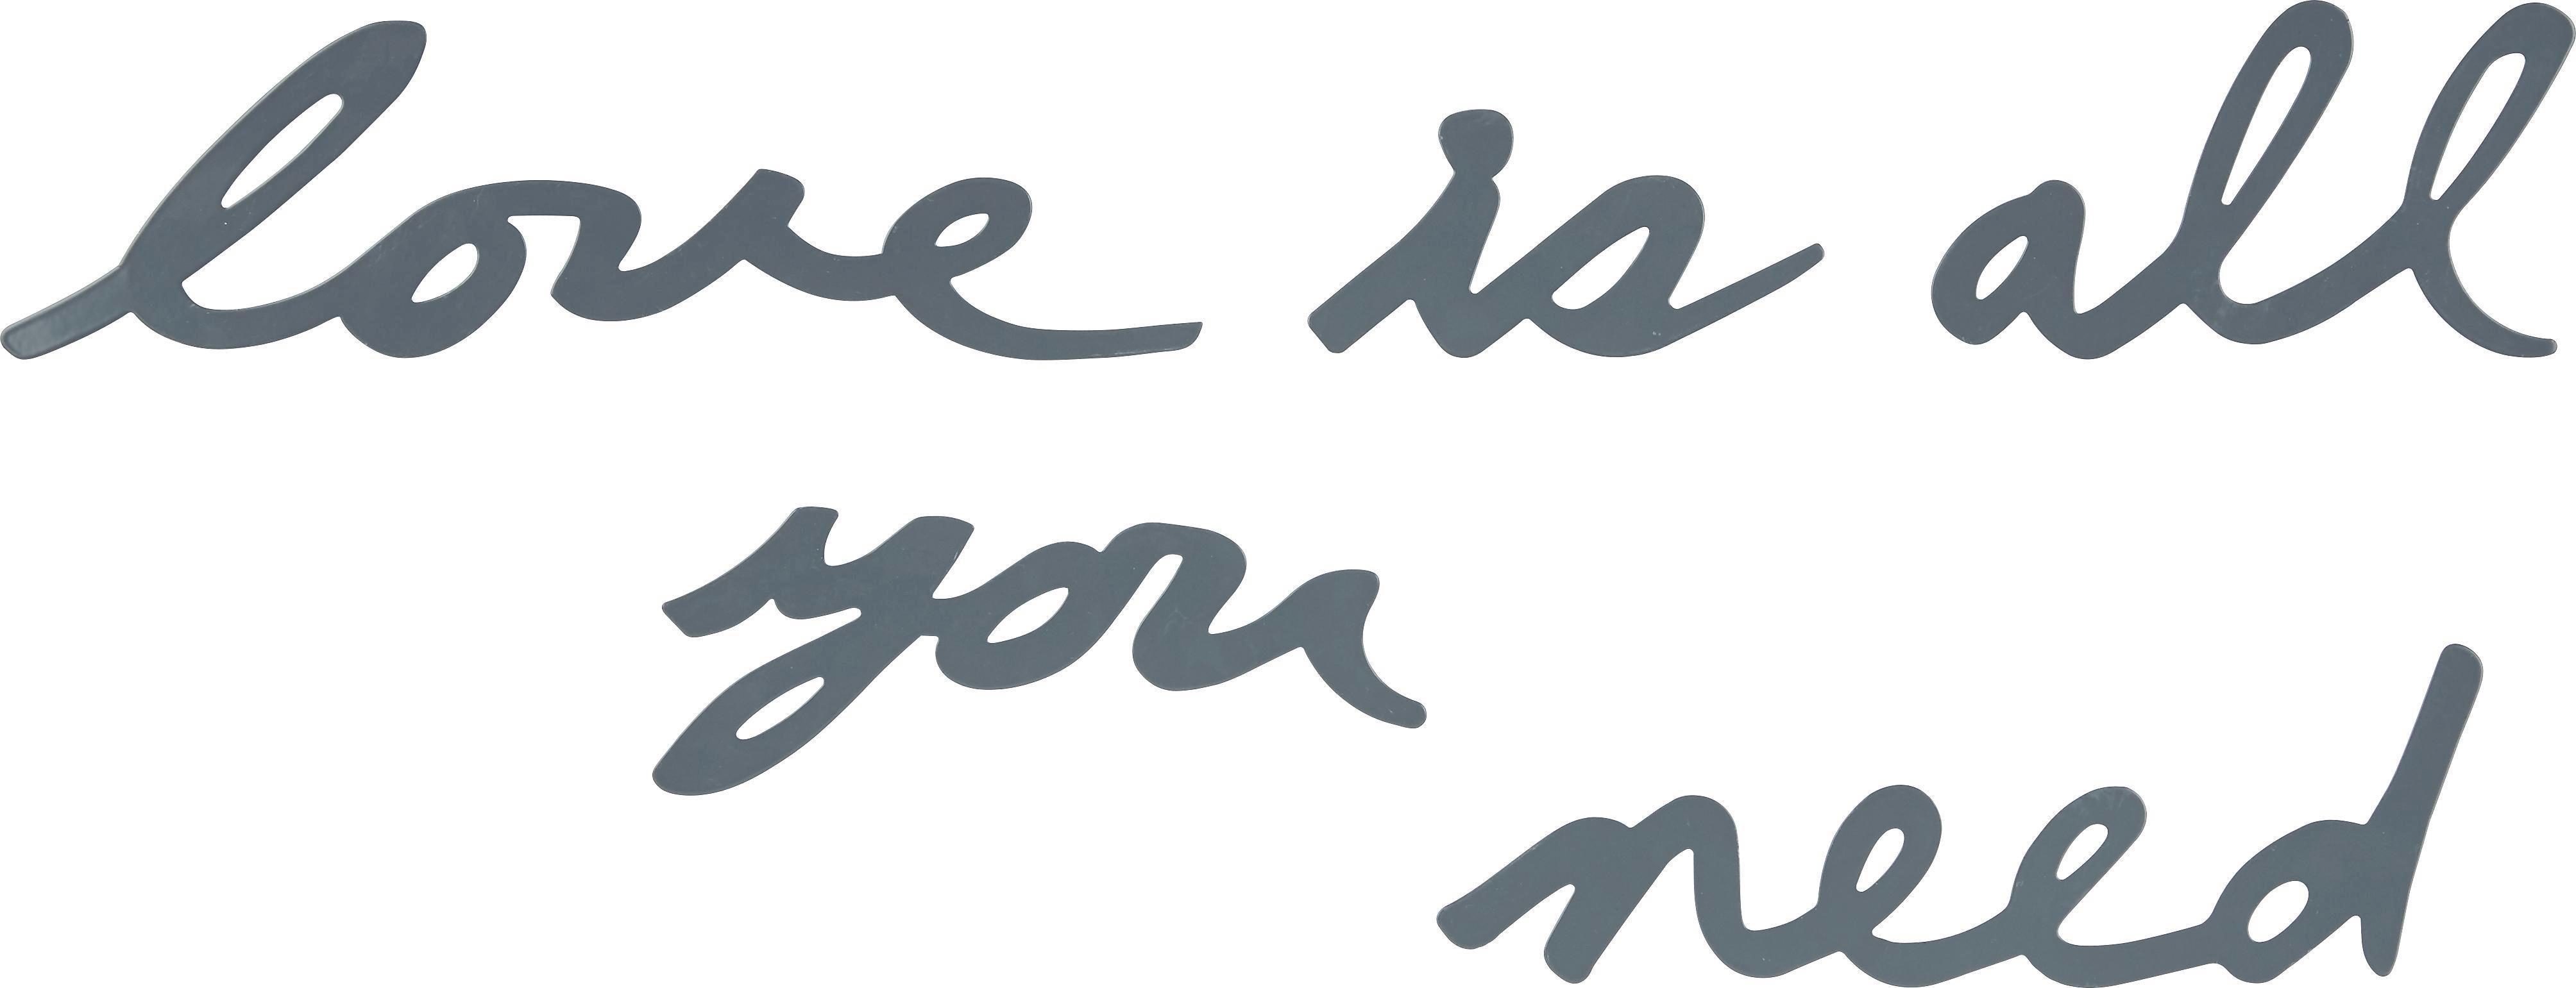 Dekobuchstaben Love Is All in Grau - Grau, MODERN, Metall - MÖMAX modern living